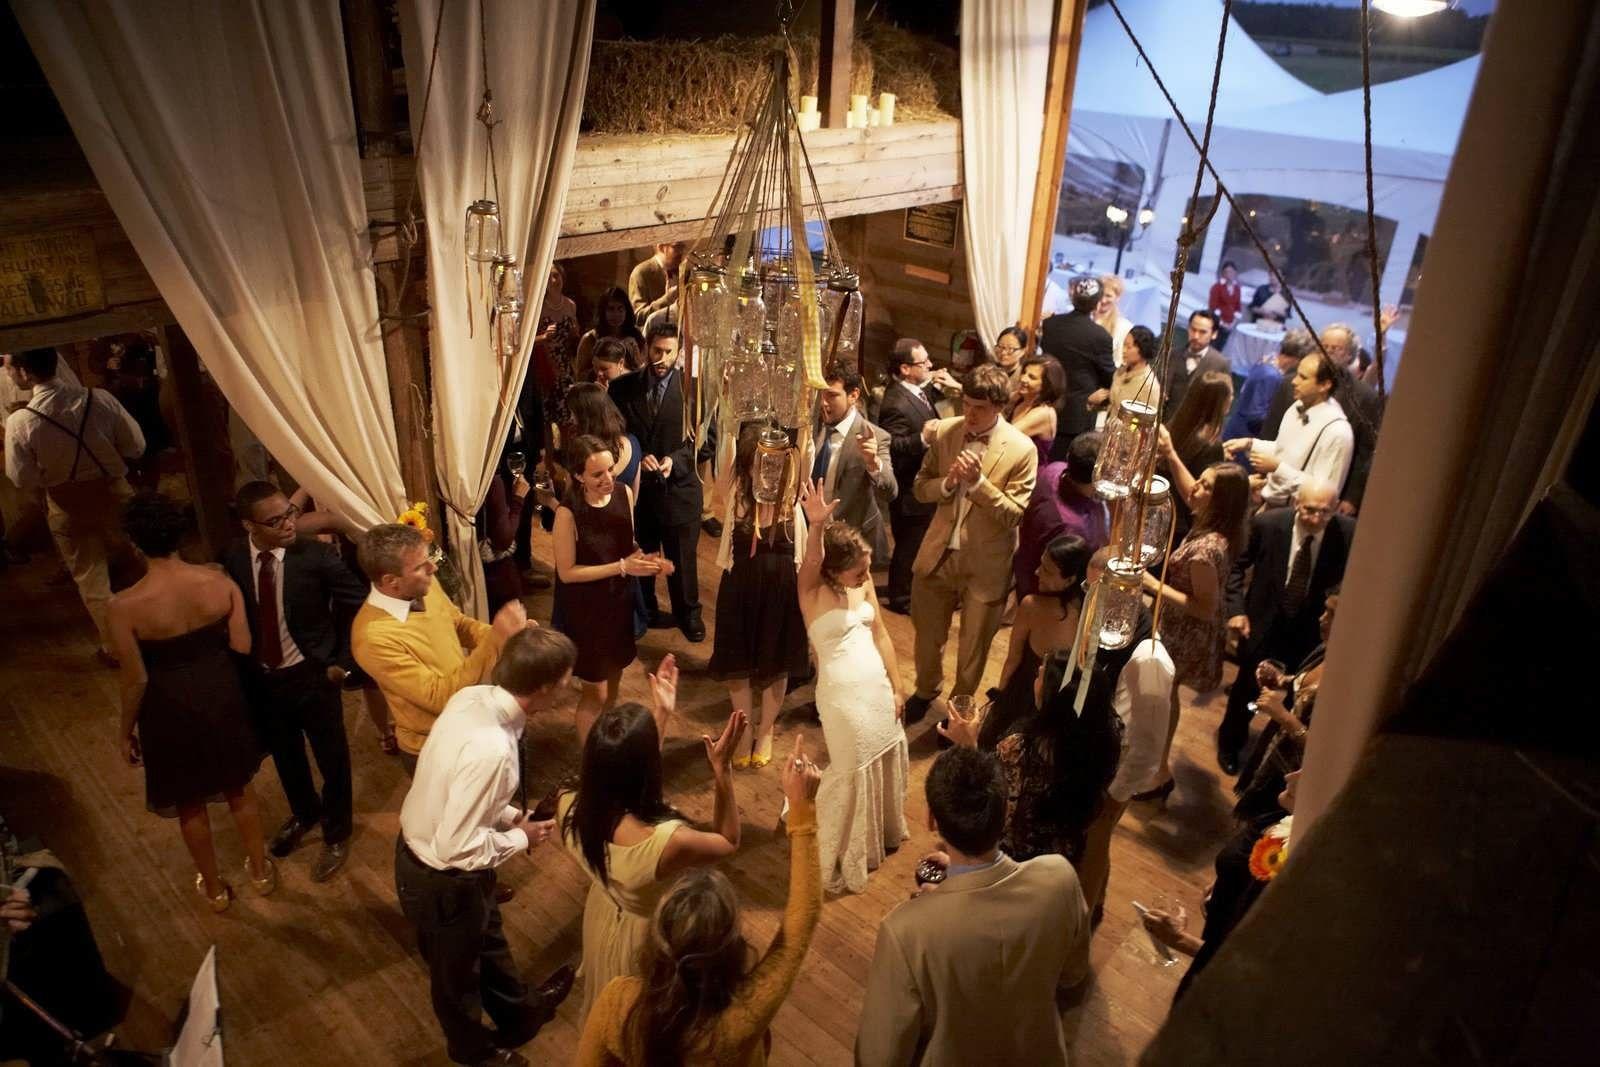 bridal shower venues long island bridal shower wedding ideas long islan venues